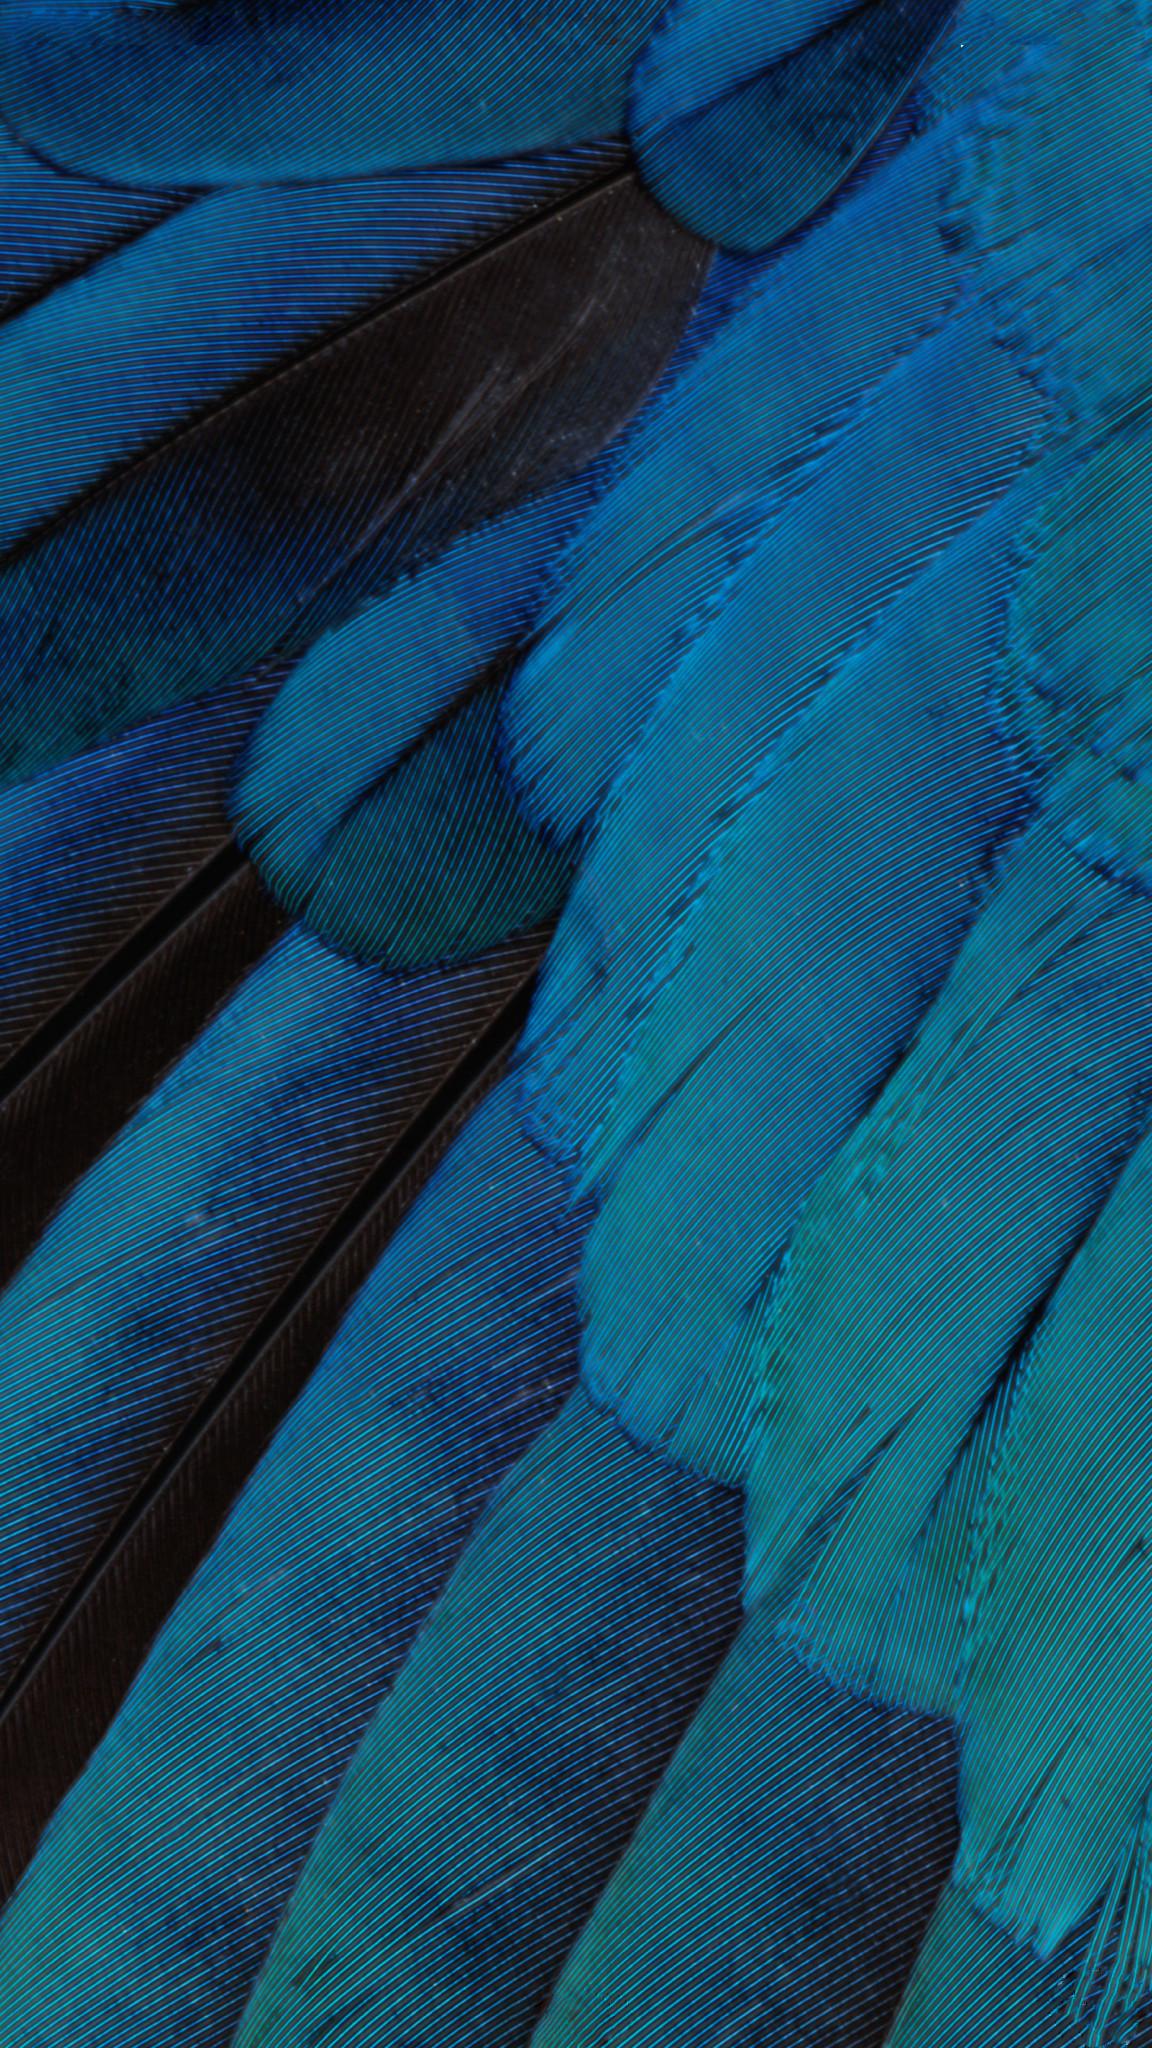 iOS 9 Feather Wallpaper #2